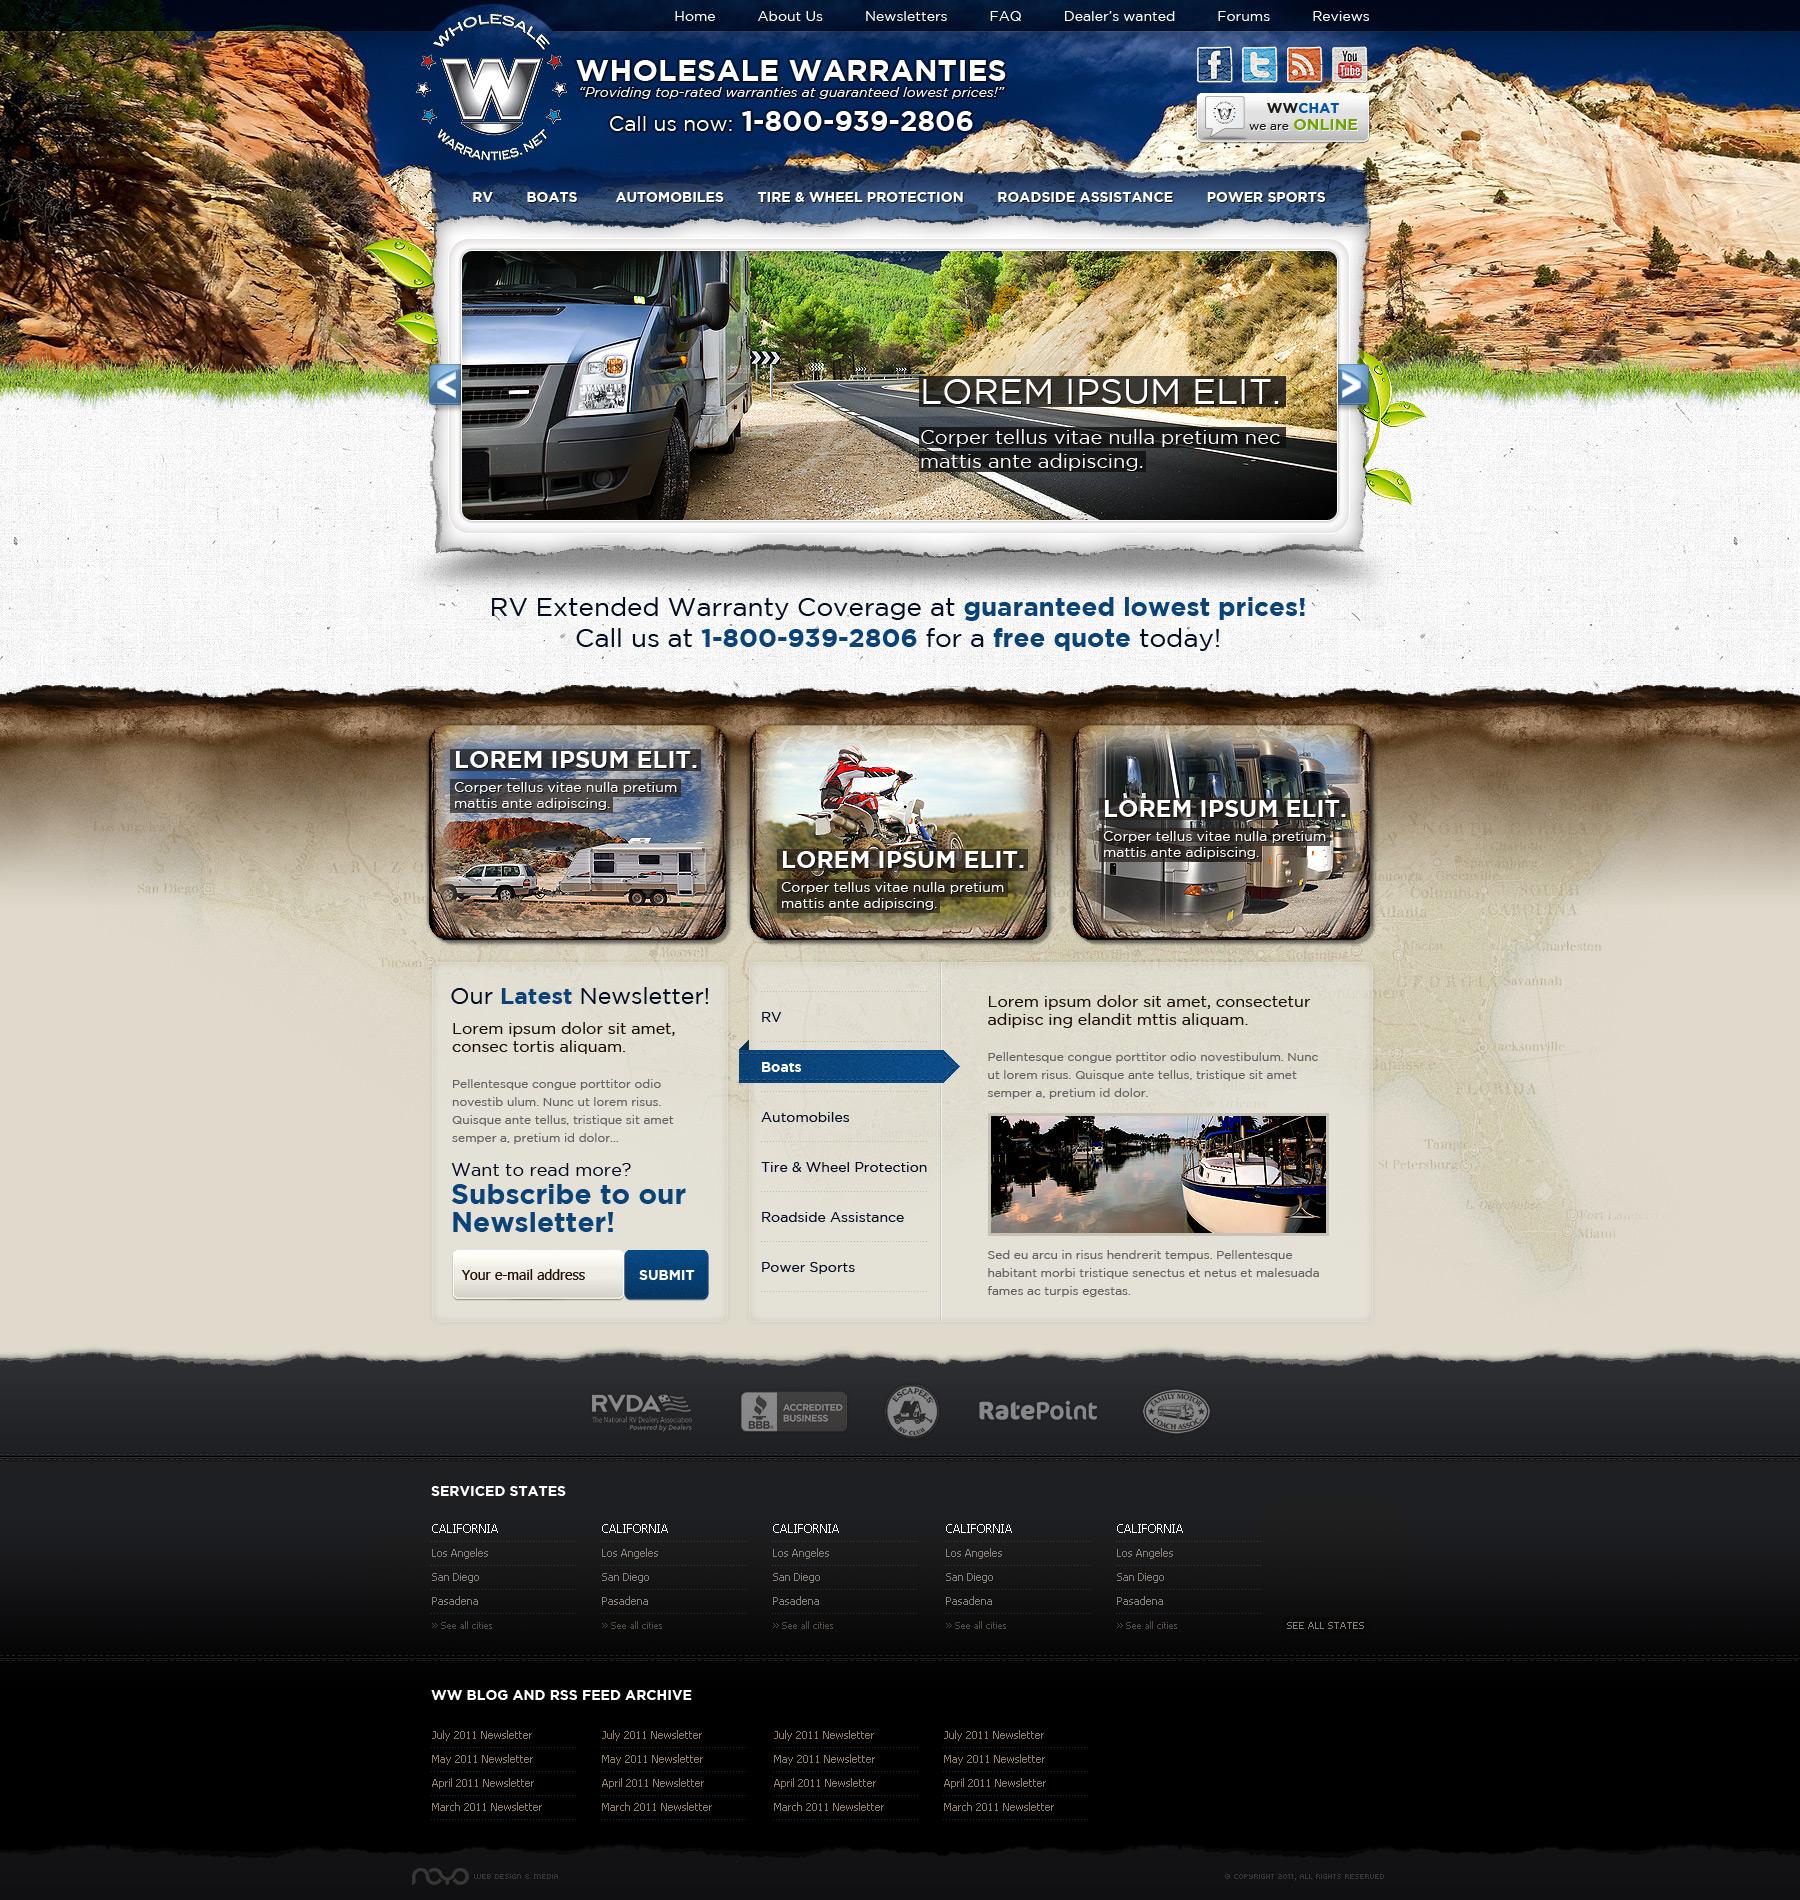 Web Design: Wholesale Warranties by VictoryDesign